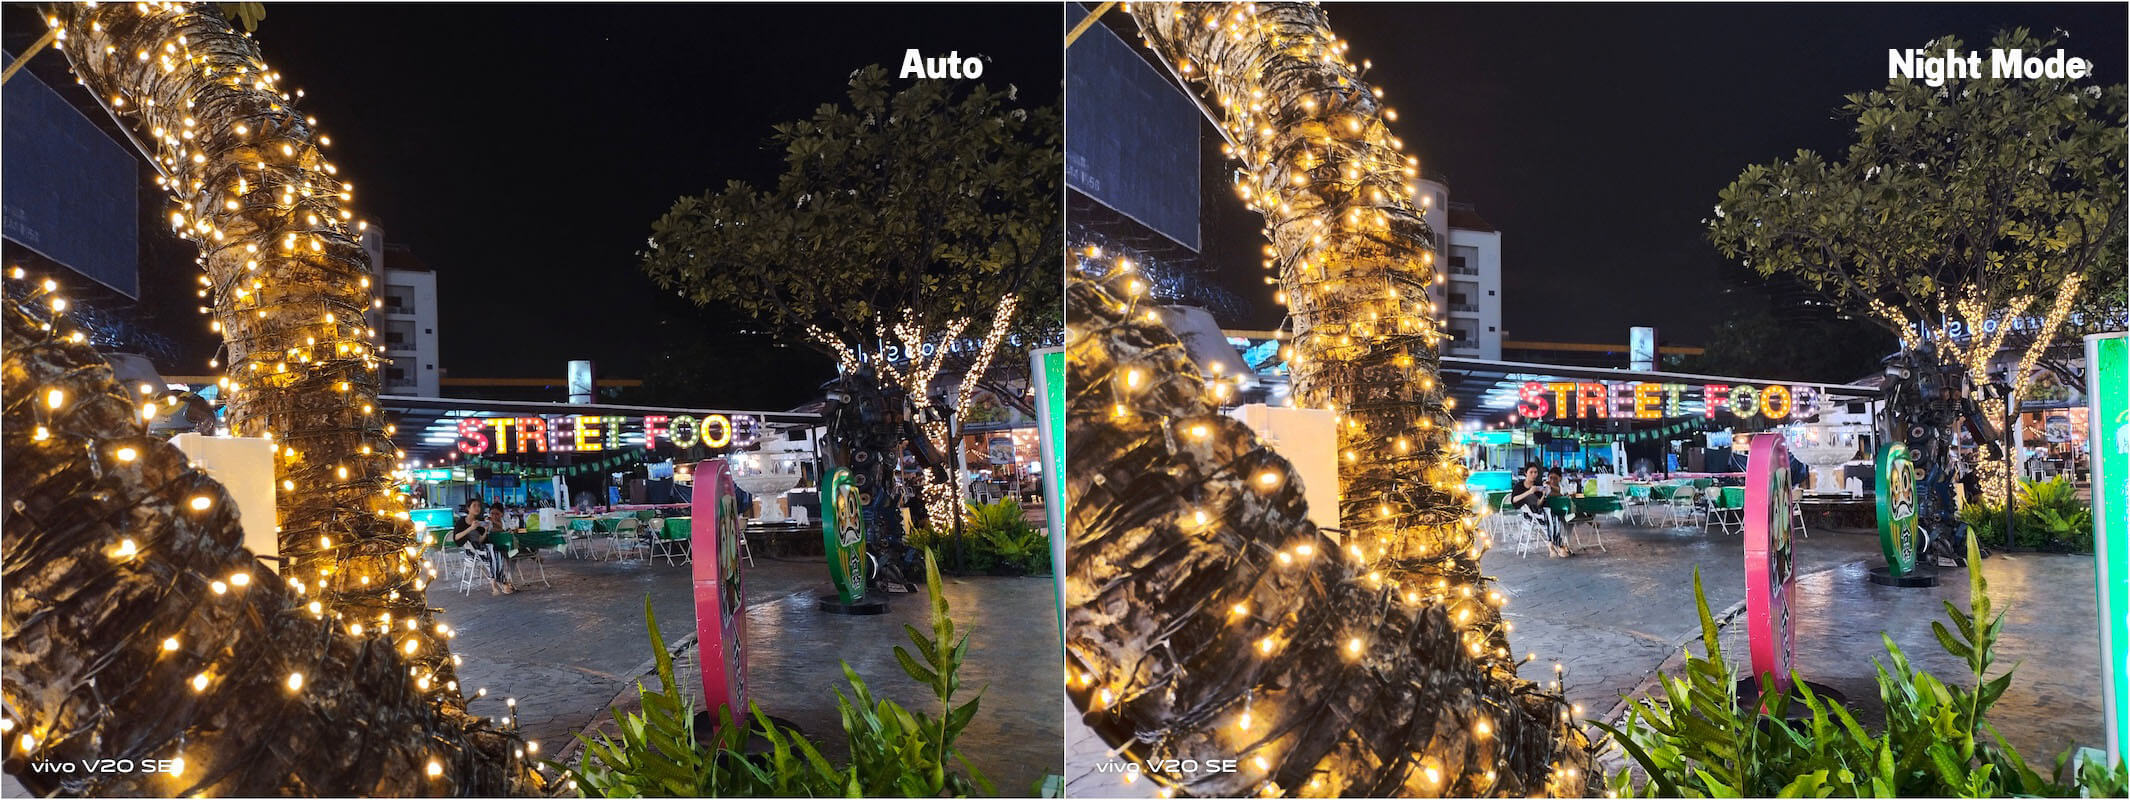 Shot on Vivo V20 SE Night Mode Compare 00005